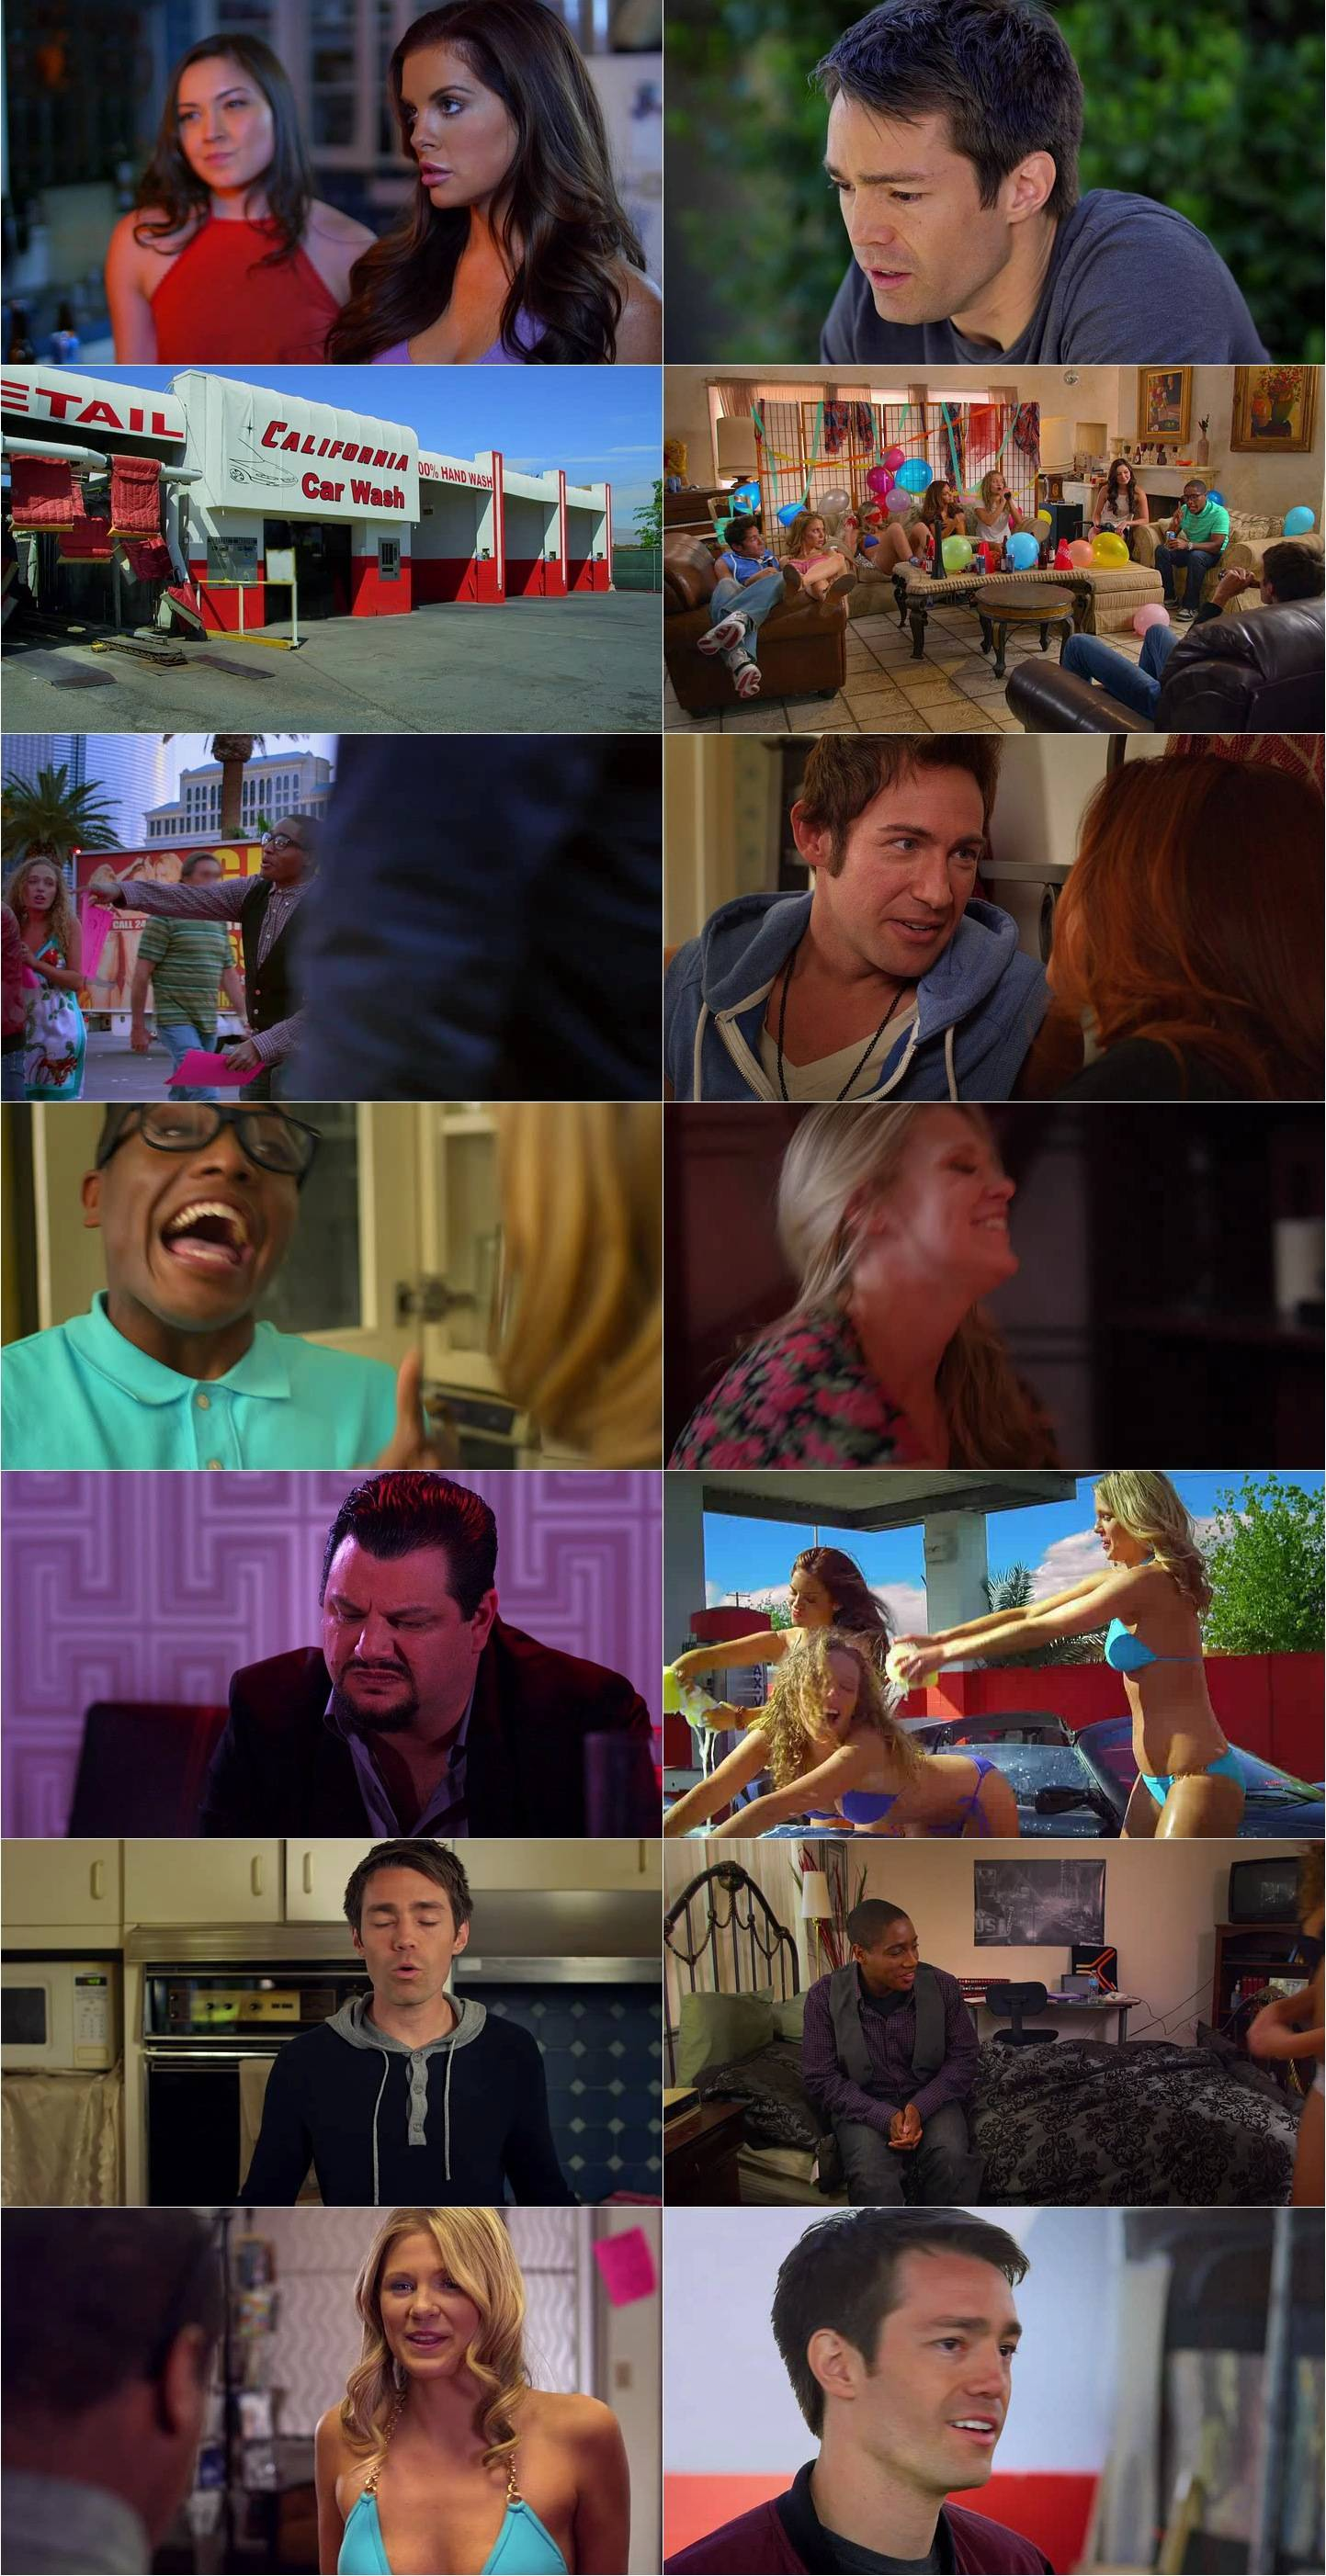 All American Bikini Wash Car Full Movie all american bikini car wash (2015) / avaxhome